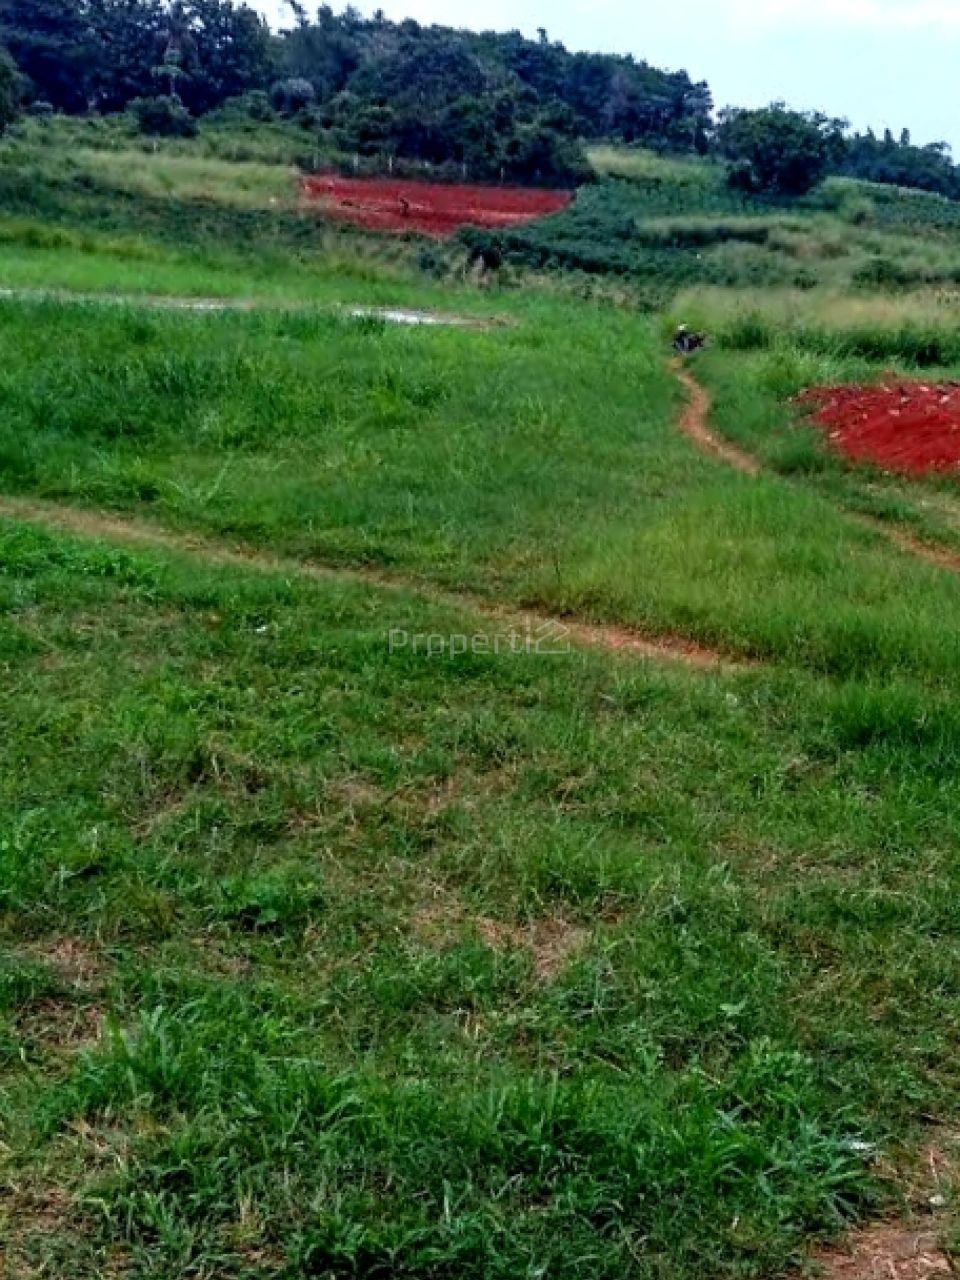 Commercial Land 9 Ha in Cibinong, Bogor, Jawa Barat